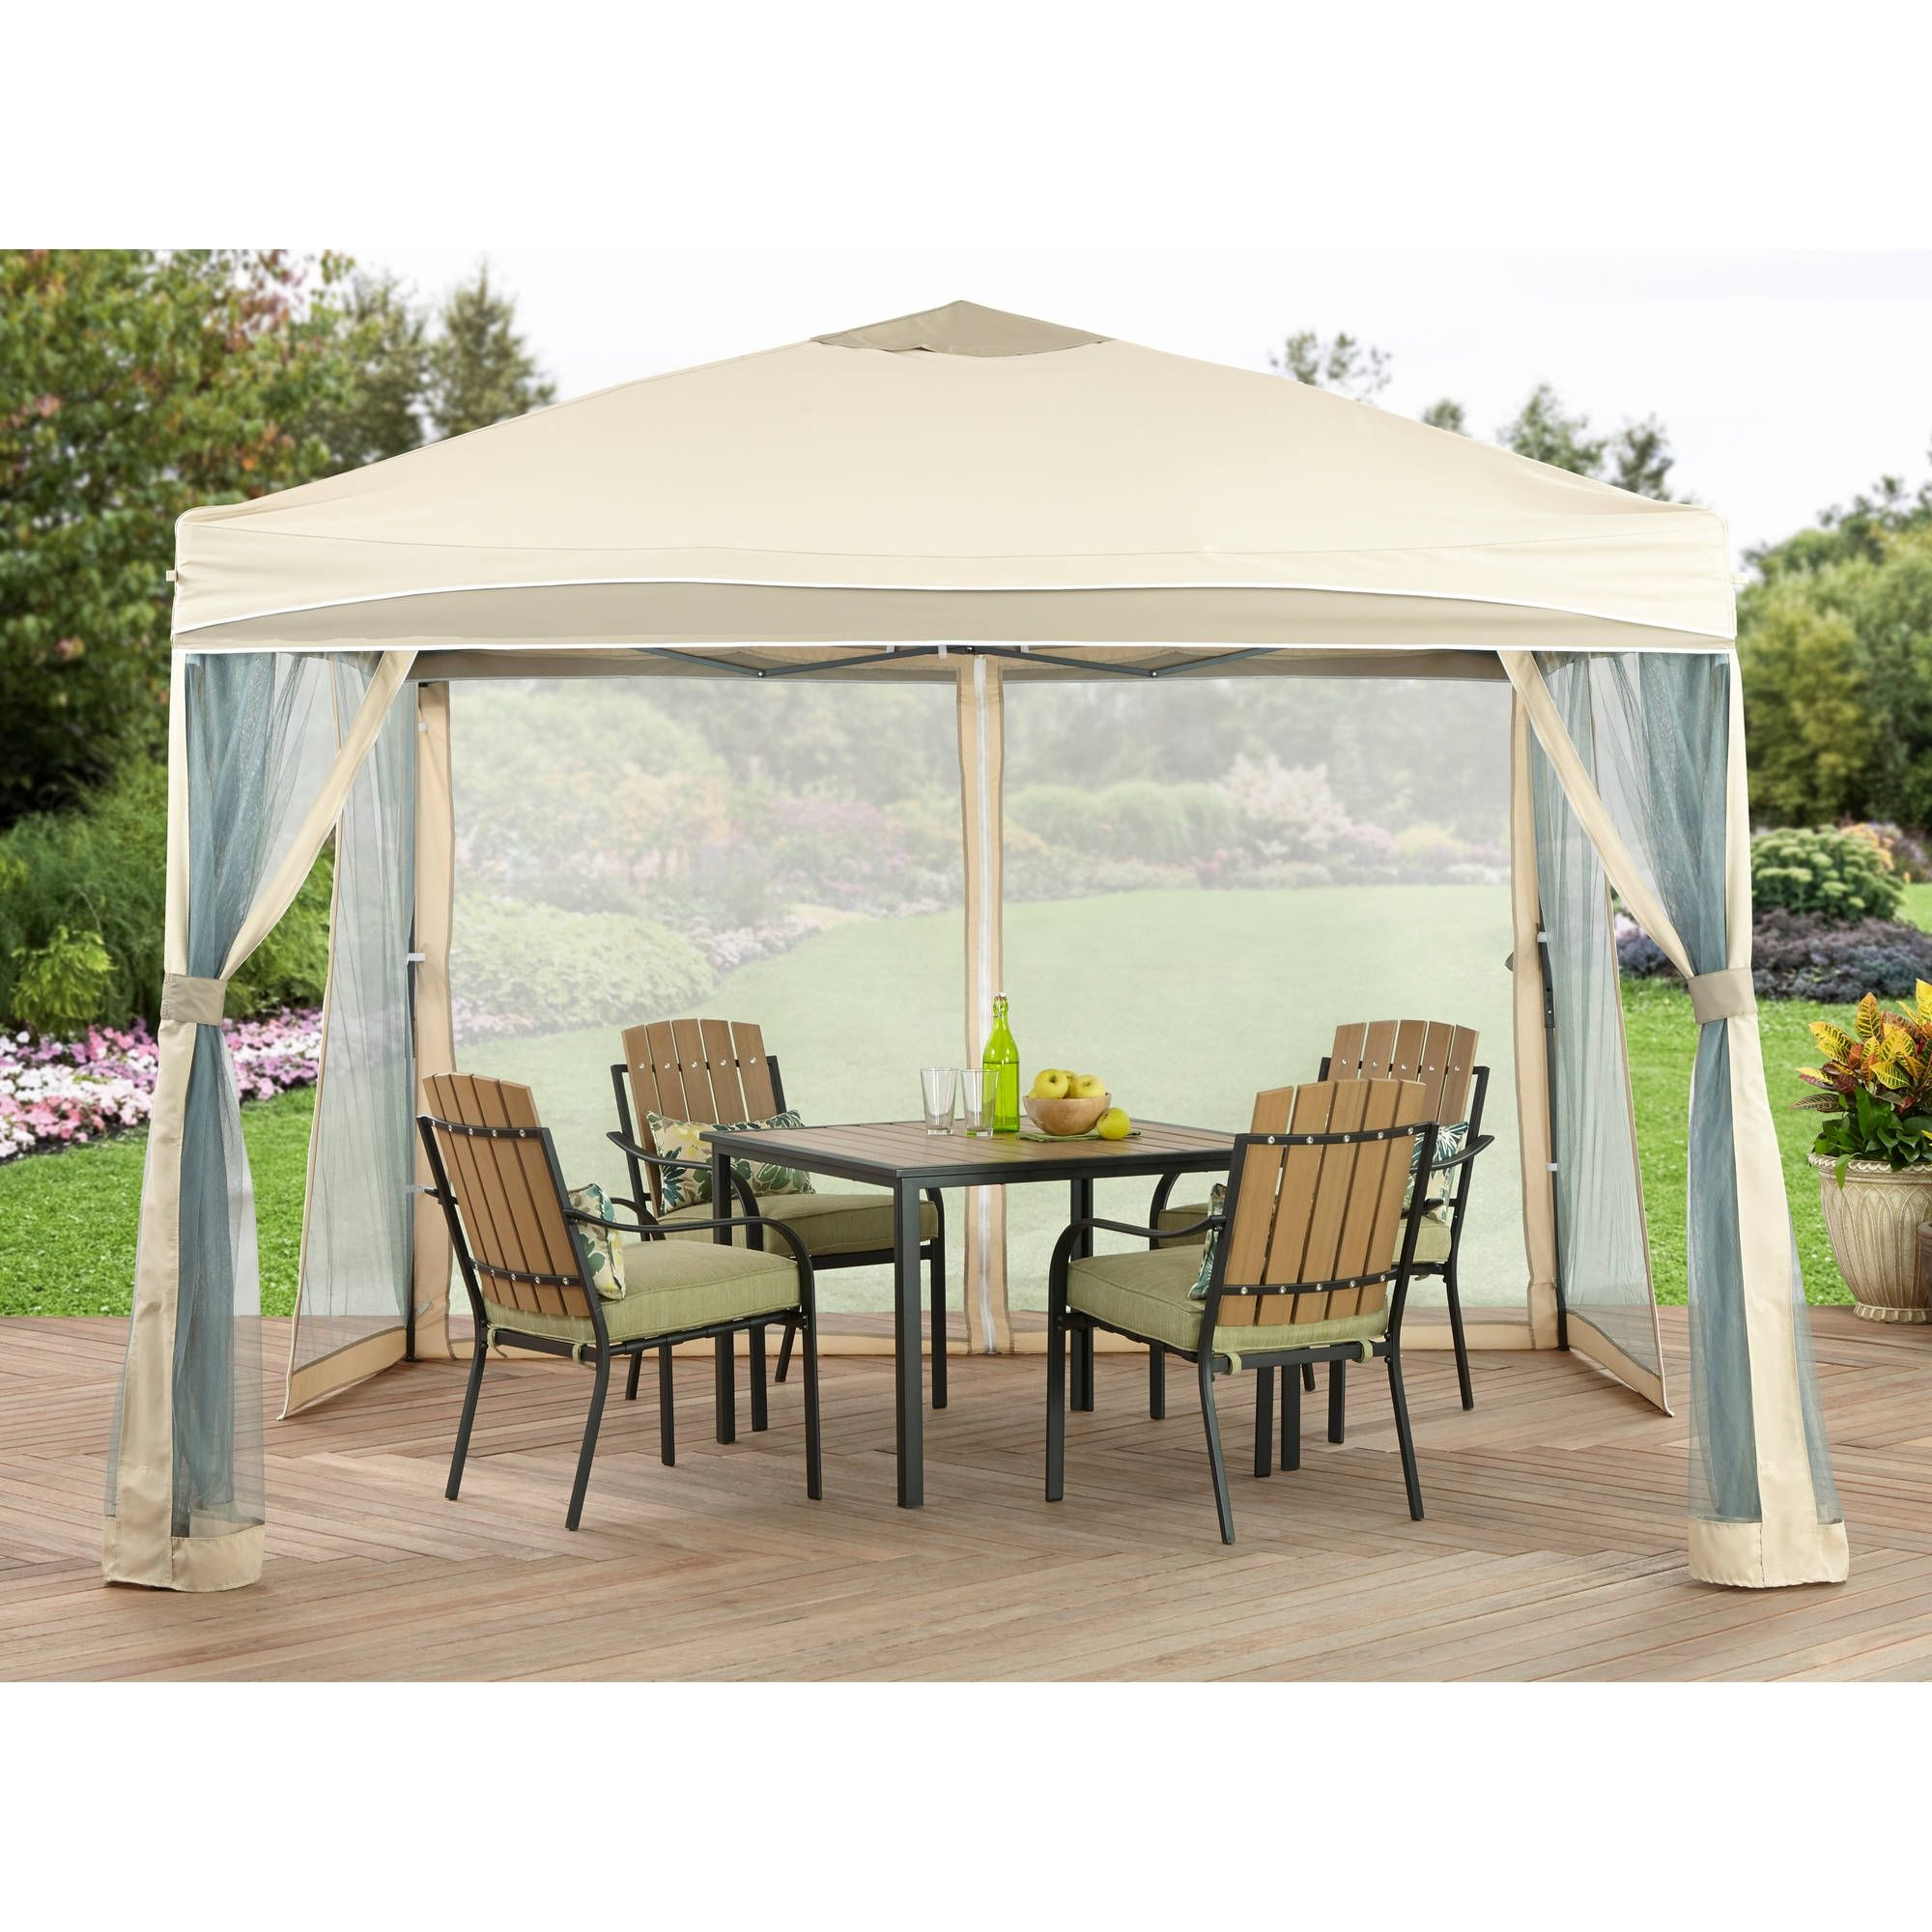 8 X 10 Canopy Gazebo Outdoor Furniture  sc 1 st  Pinterest & 8 X 10 Canopy Gazebo Outdoor Furniture | http://web2review.info ...